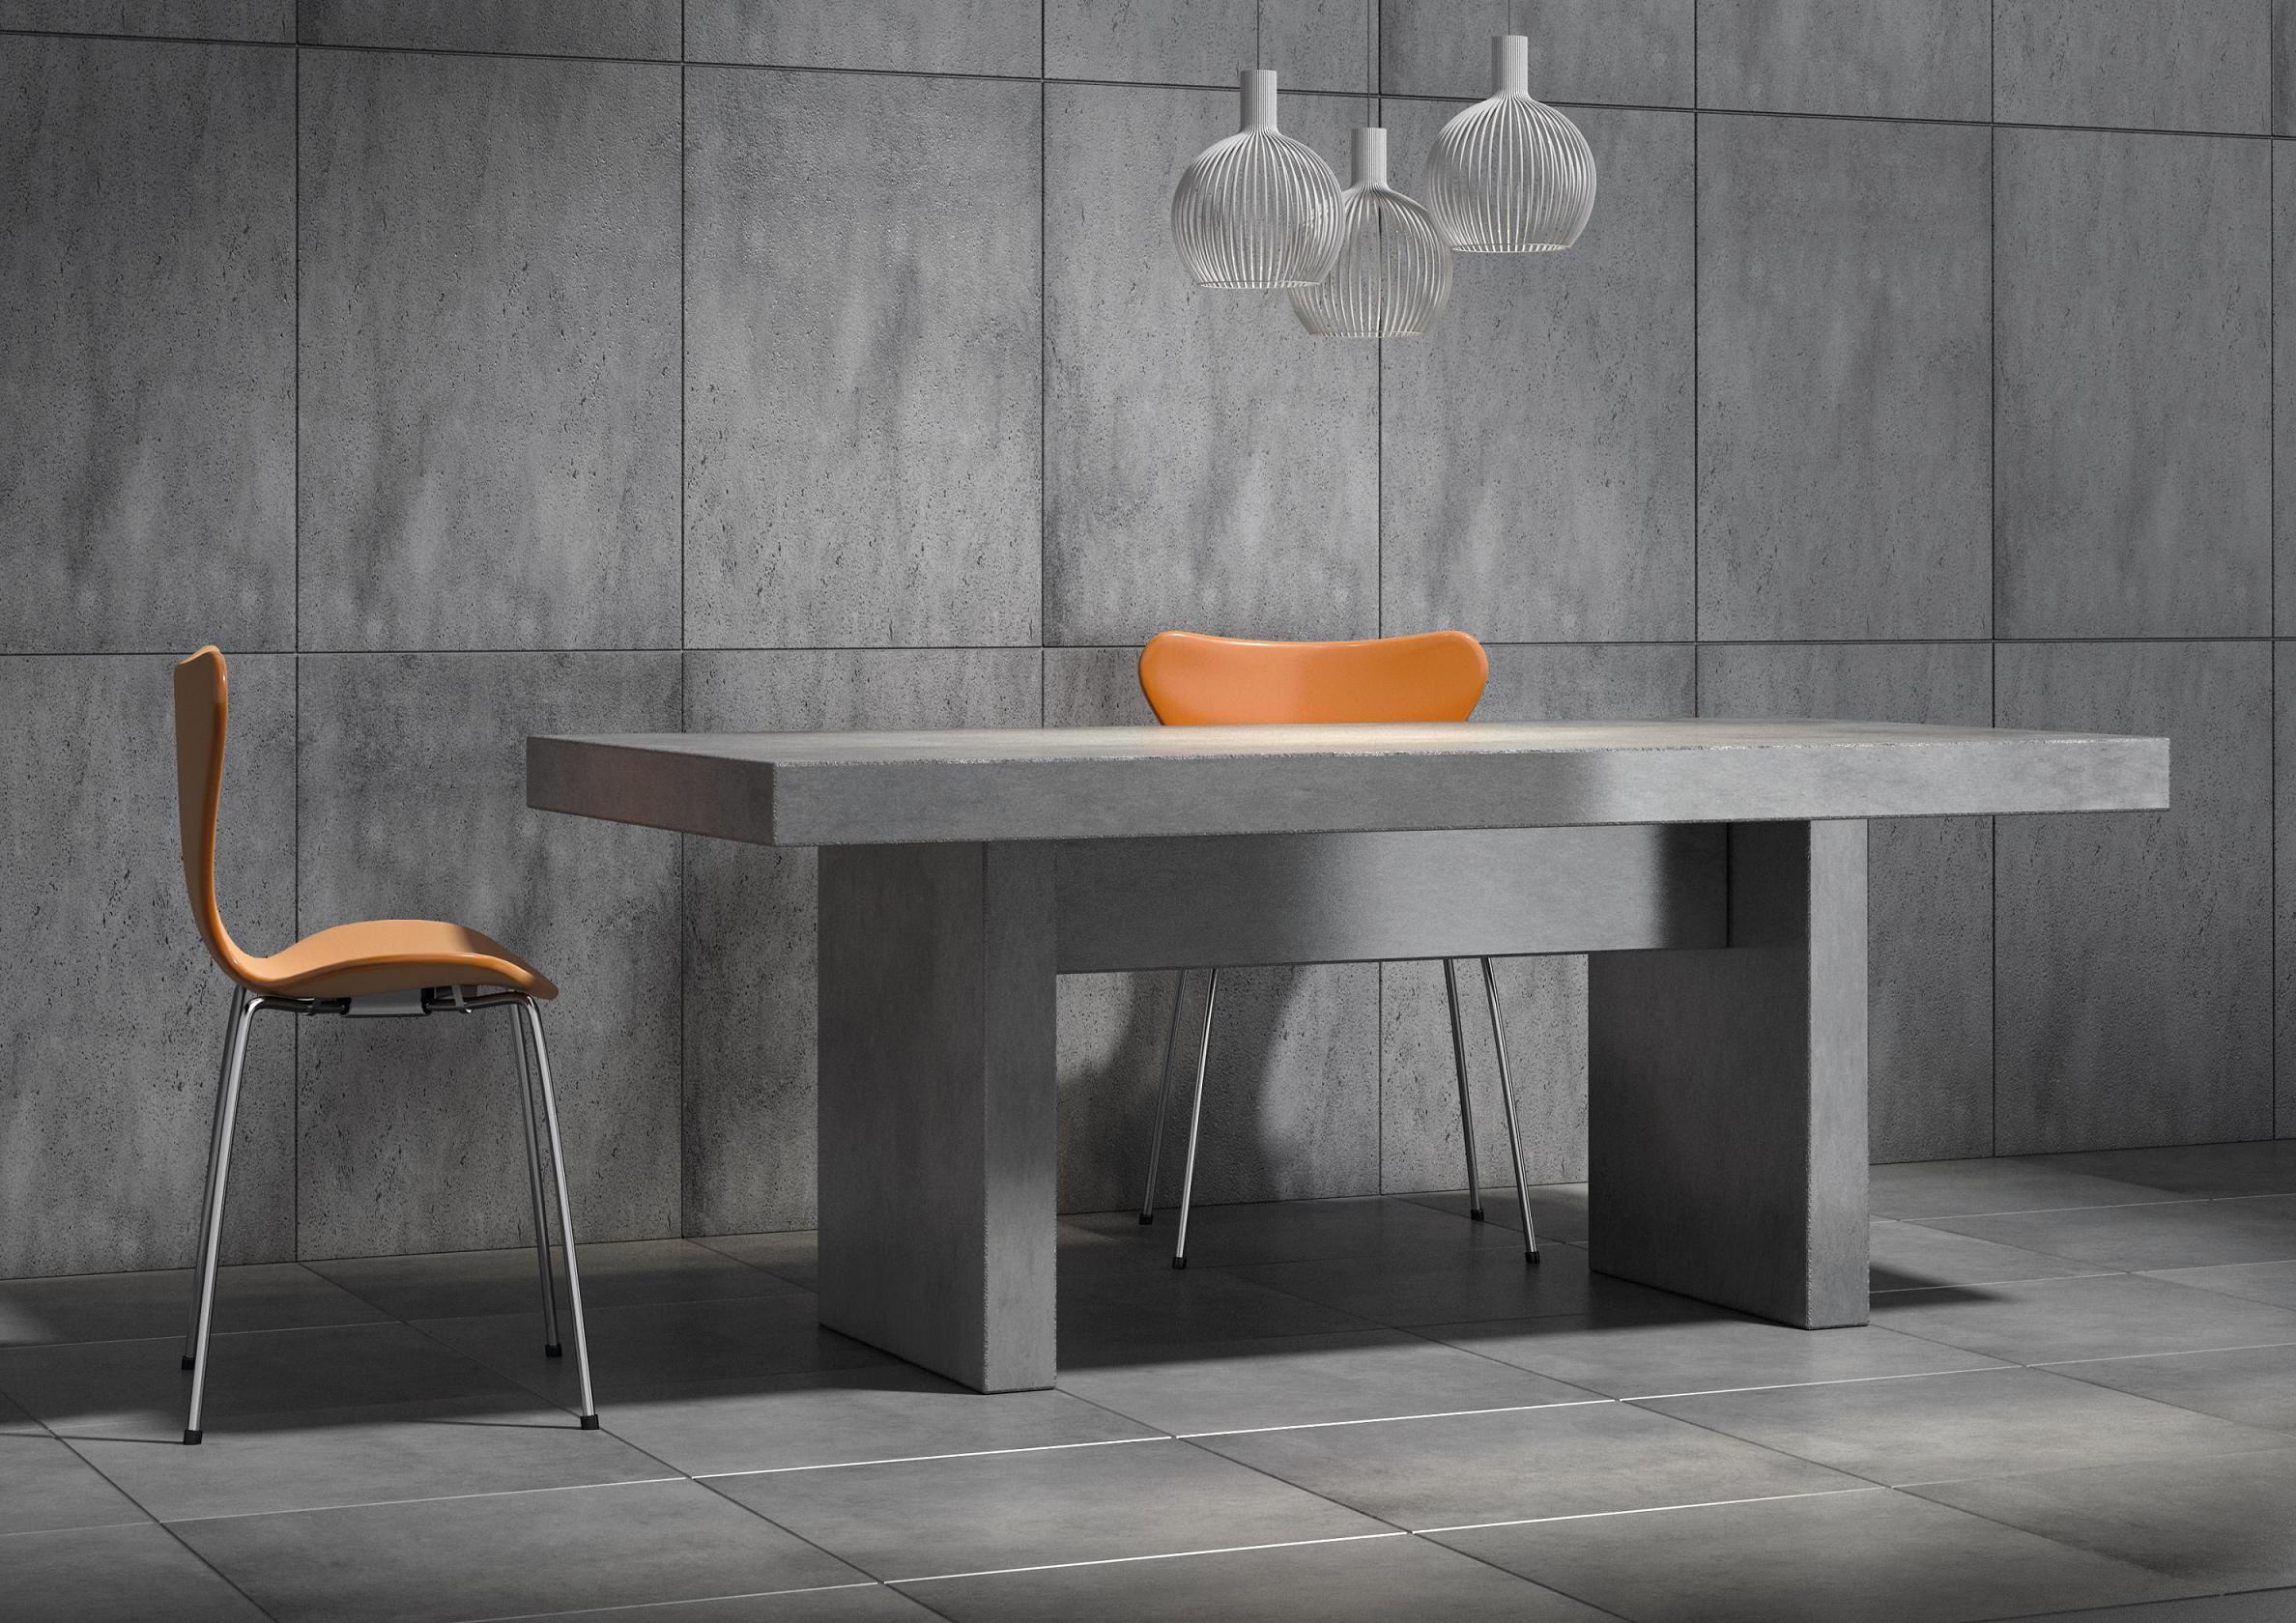 Design jutra – beton architektoniczny Morgan & Möller. Nowa polska marka